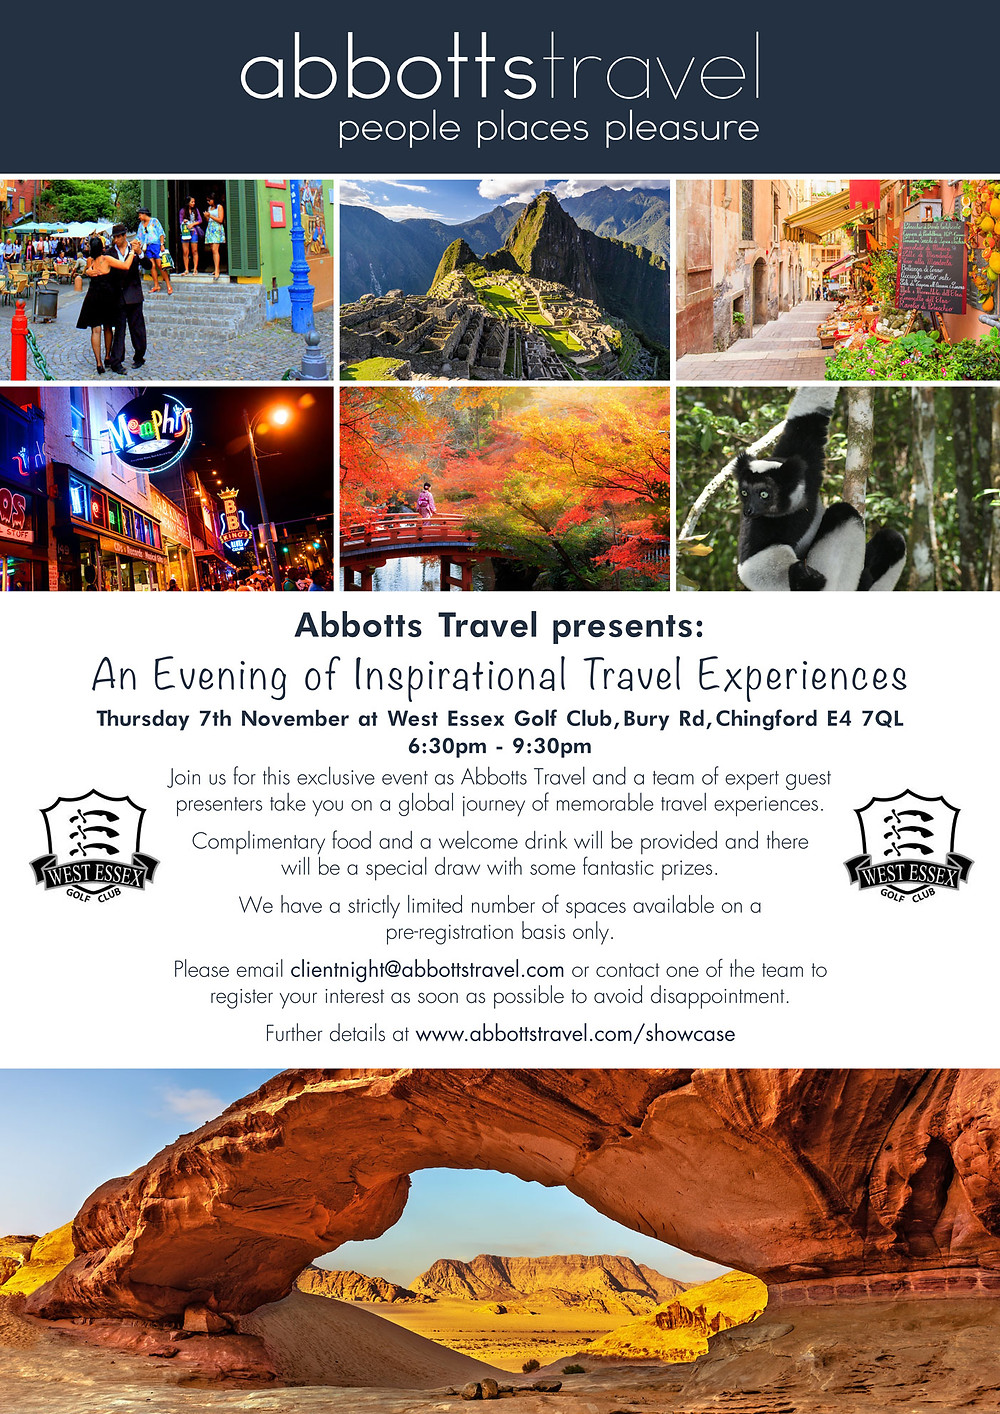 Showcase Event: An Evening of Inspirational Travel Experiences - 7 November 2019